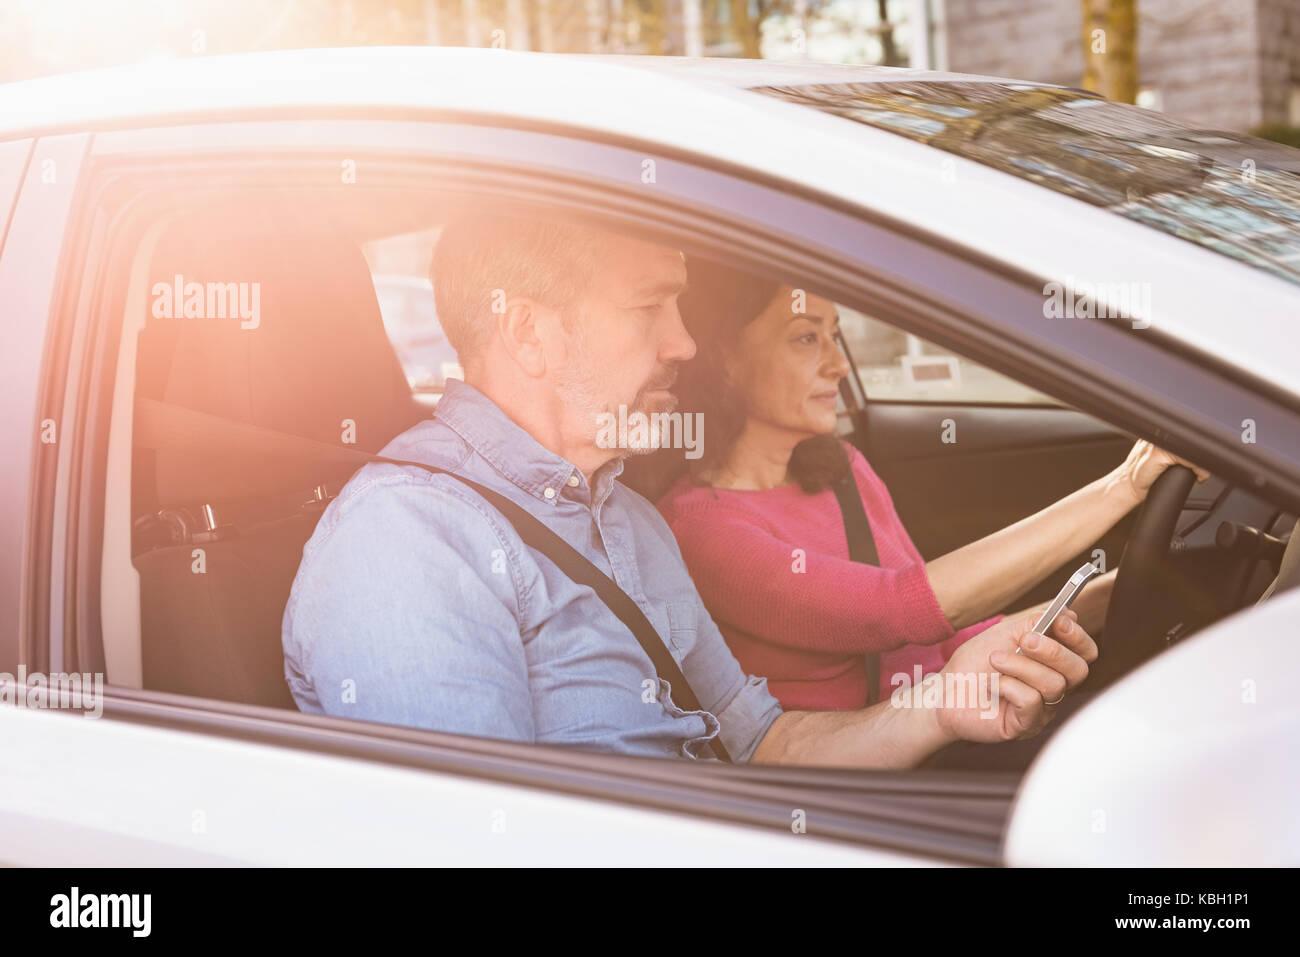 2932x2932 Pubg Android Game 4k Ipad Pro Retina Display Hd: Car Safety Seat Stock Photos & Car Safety Seat Stock